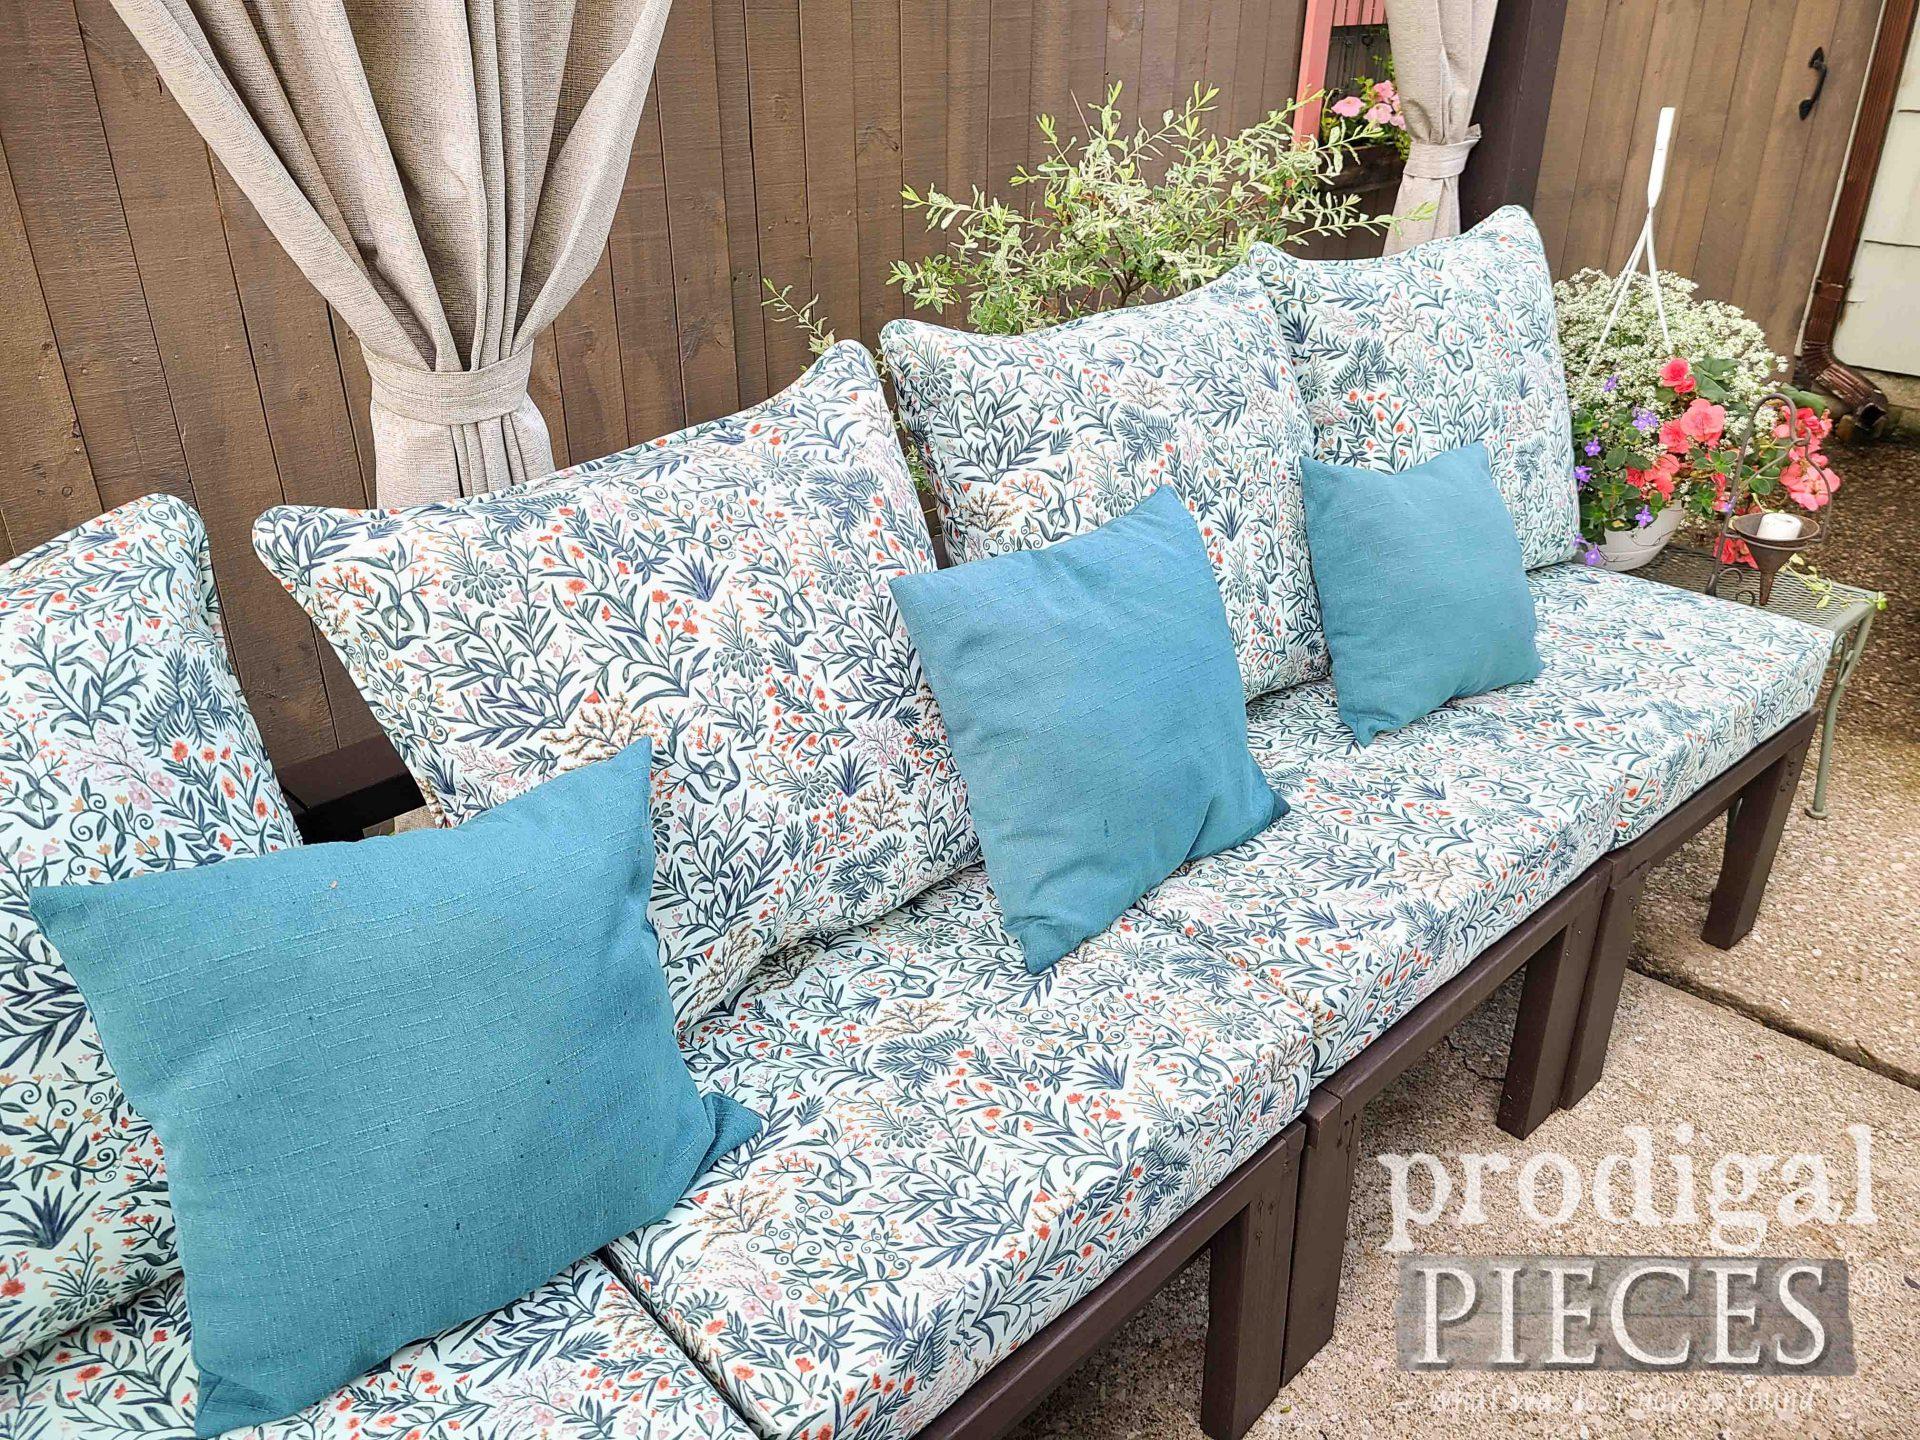 DIY Patio Sectional Sofa Cushions | prodigalpieces.com #prodigalpieces #patio #diy #outdoor